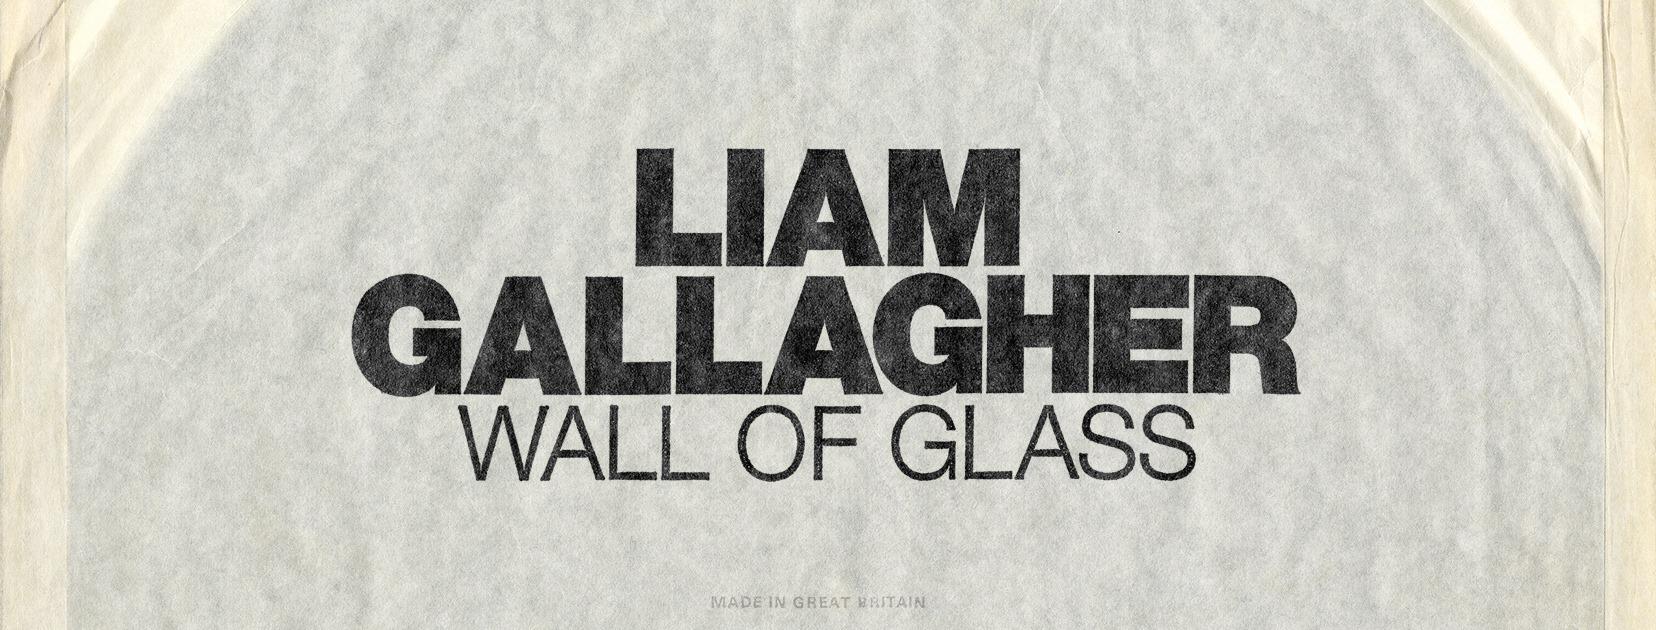 pop rock, oasis, nouveau, single, album, Liam Gallagher, Wall Of Glass